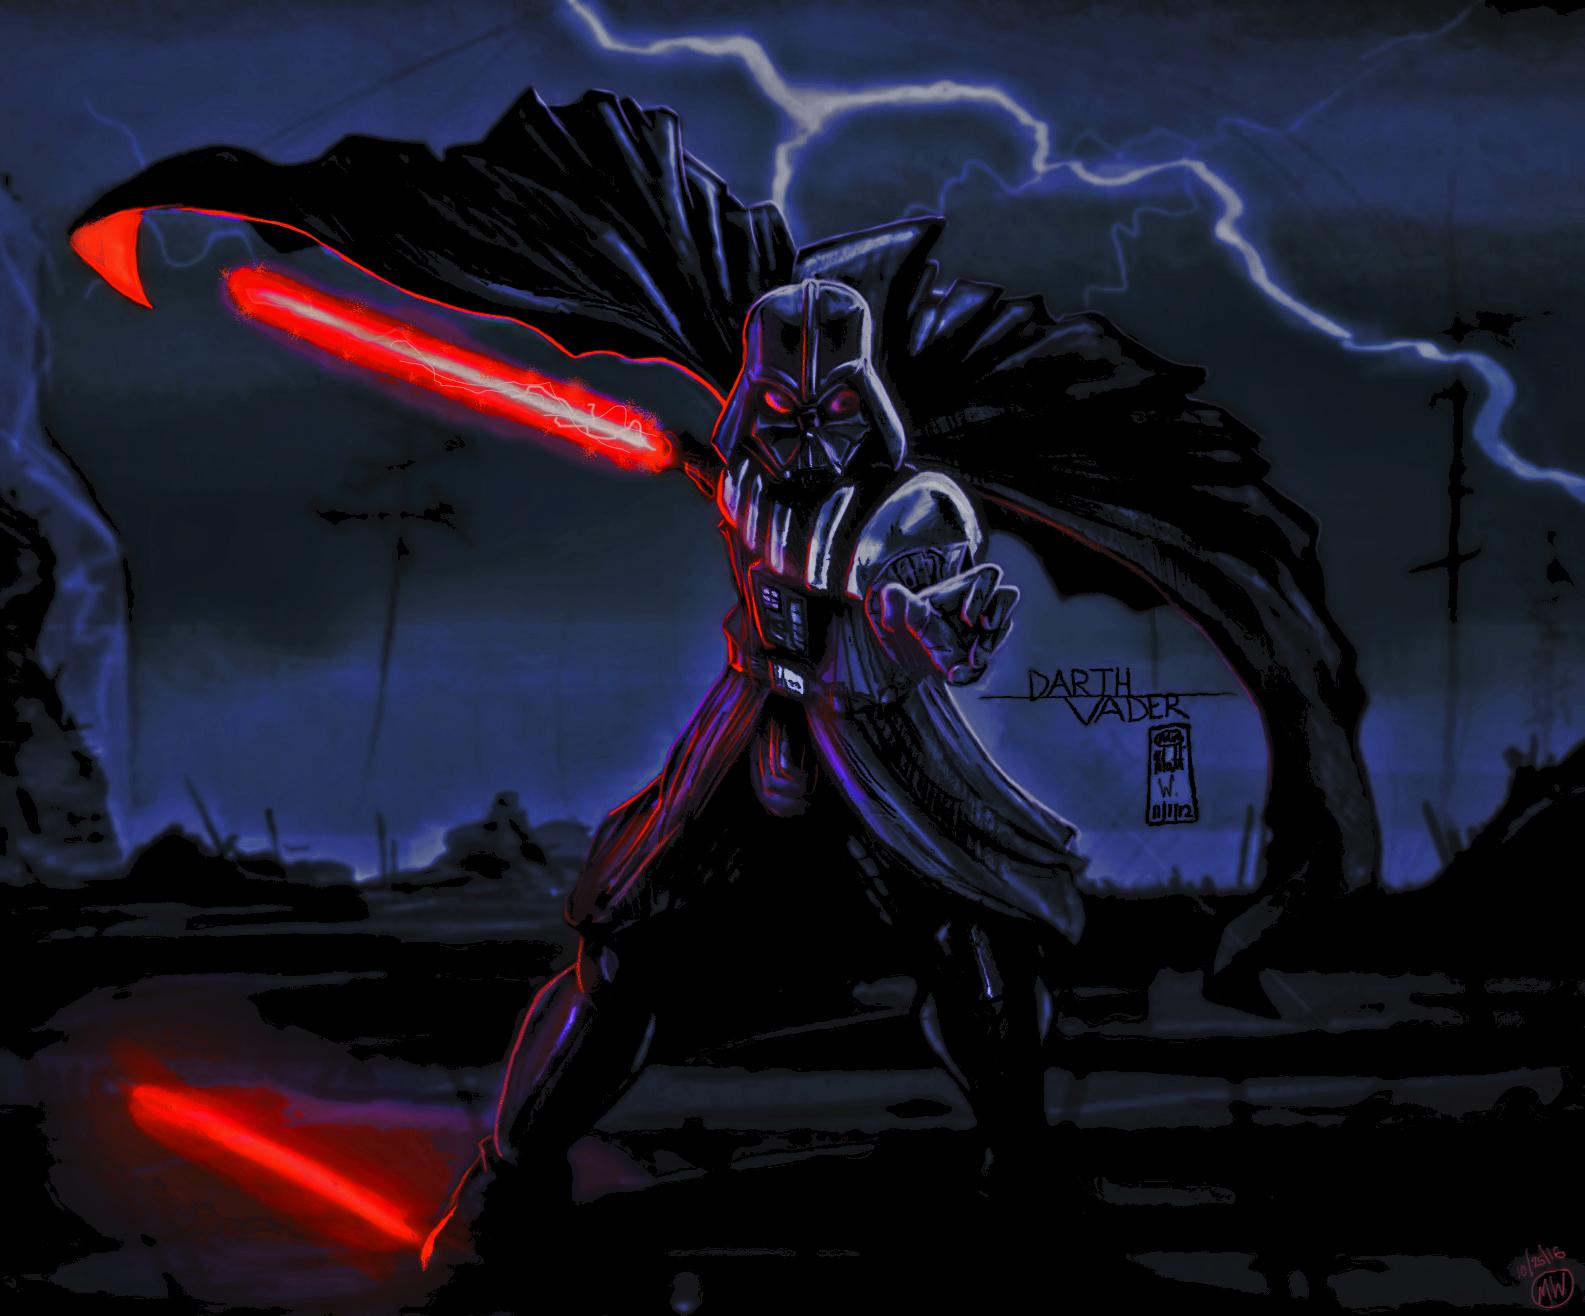 MW Darth Vader